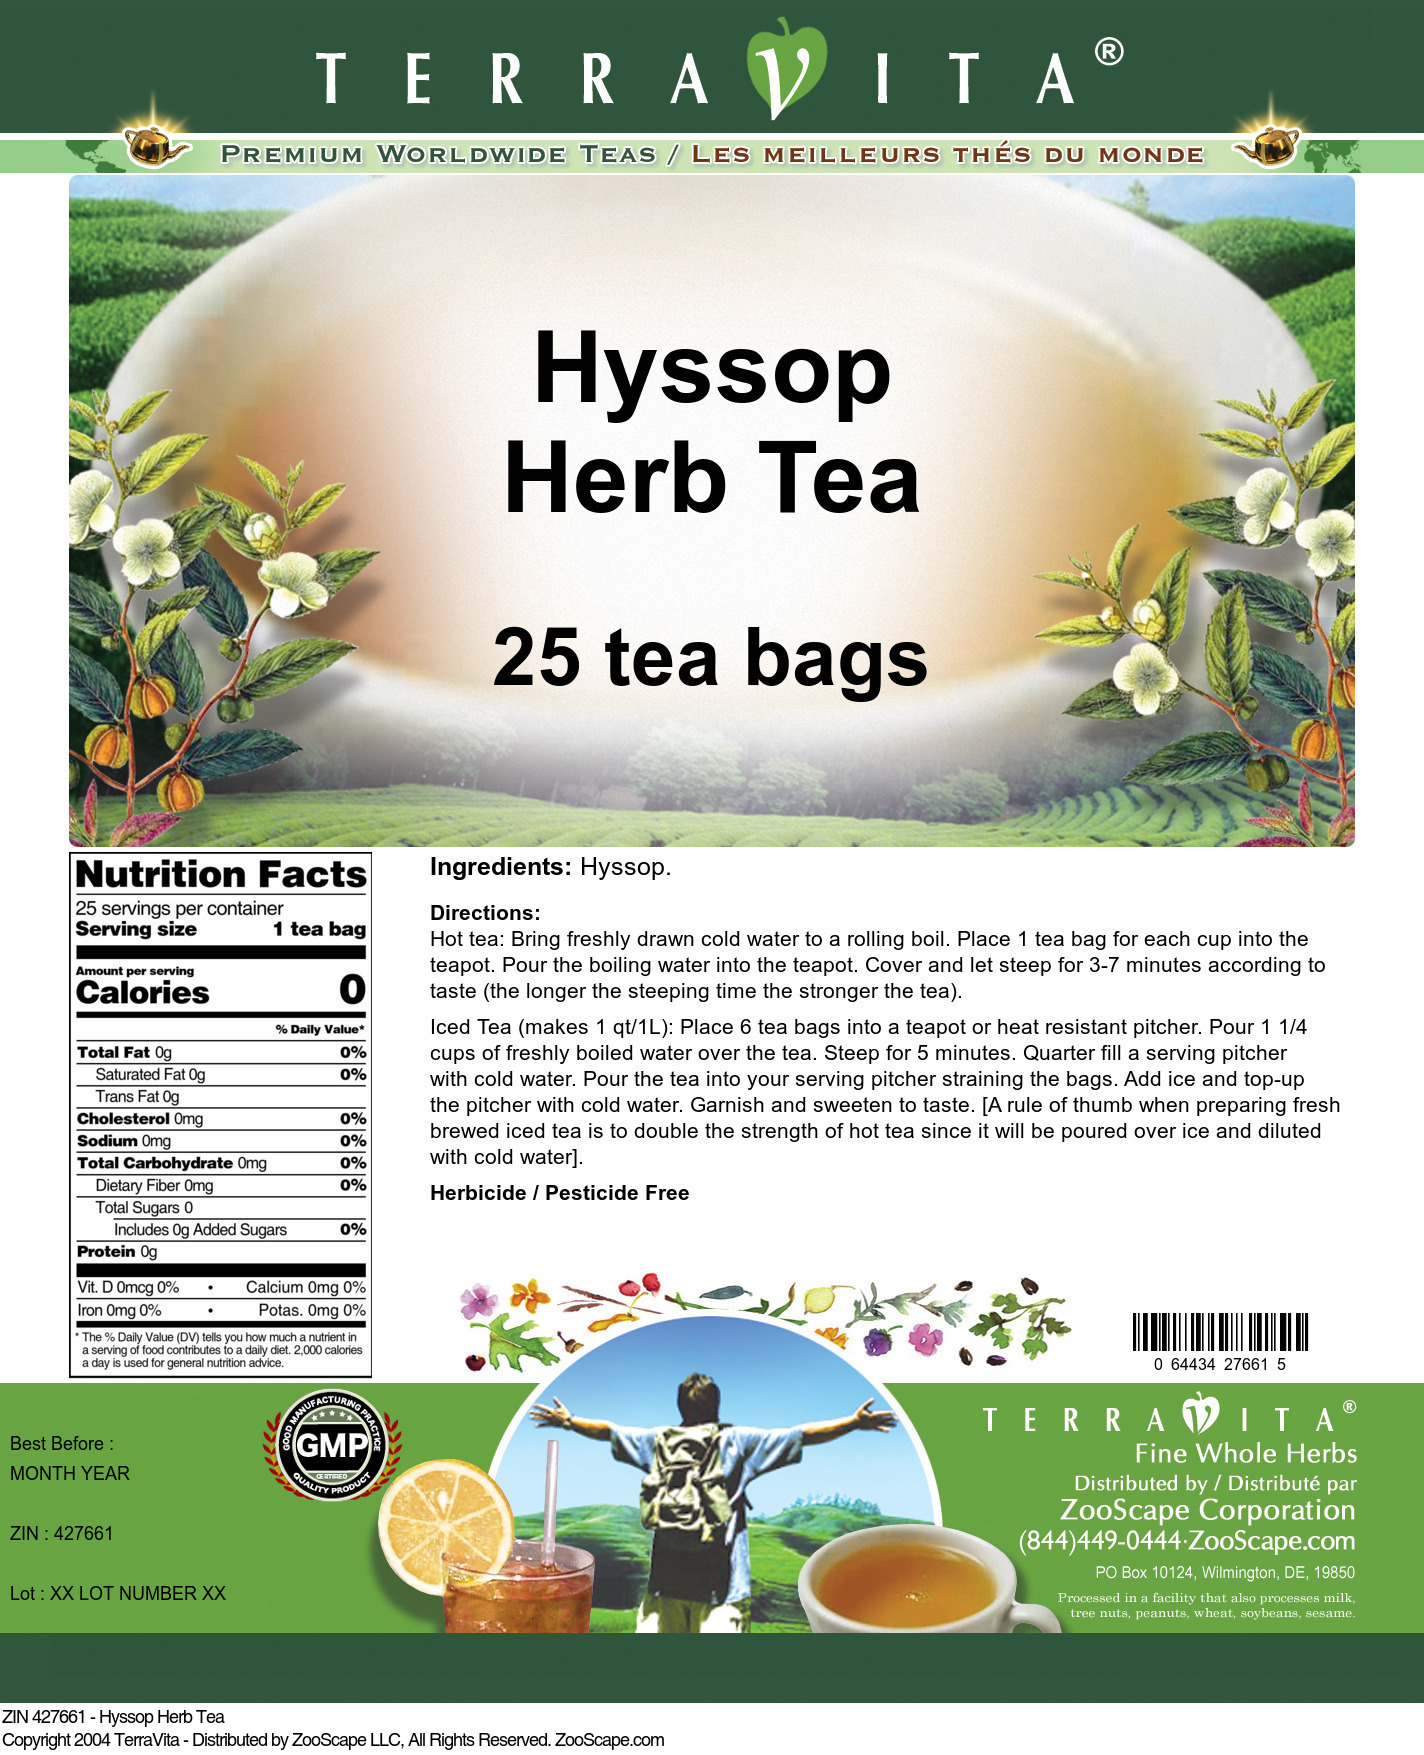 Hyssop Herb Tea